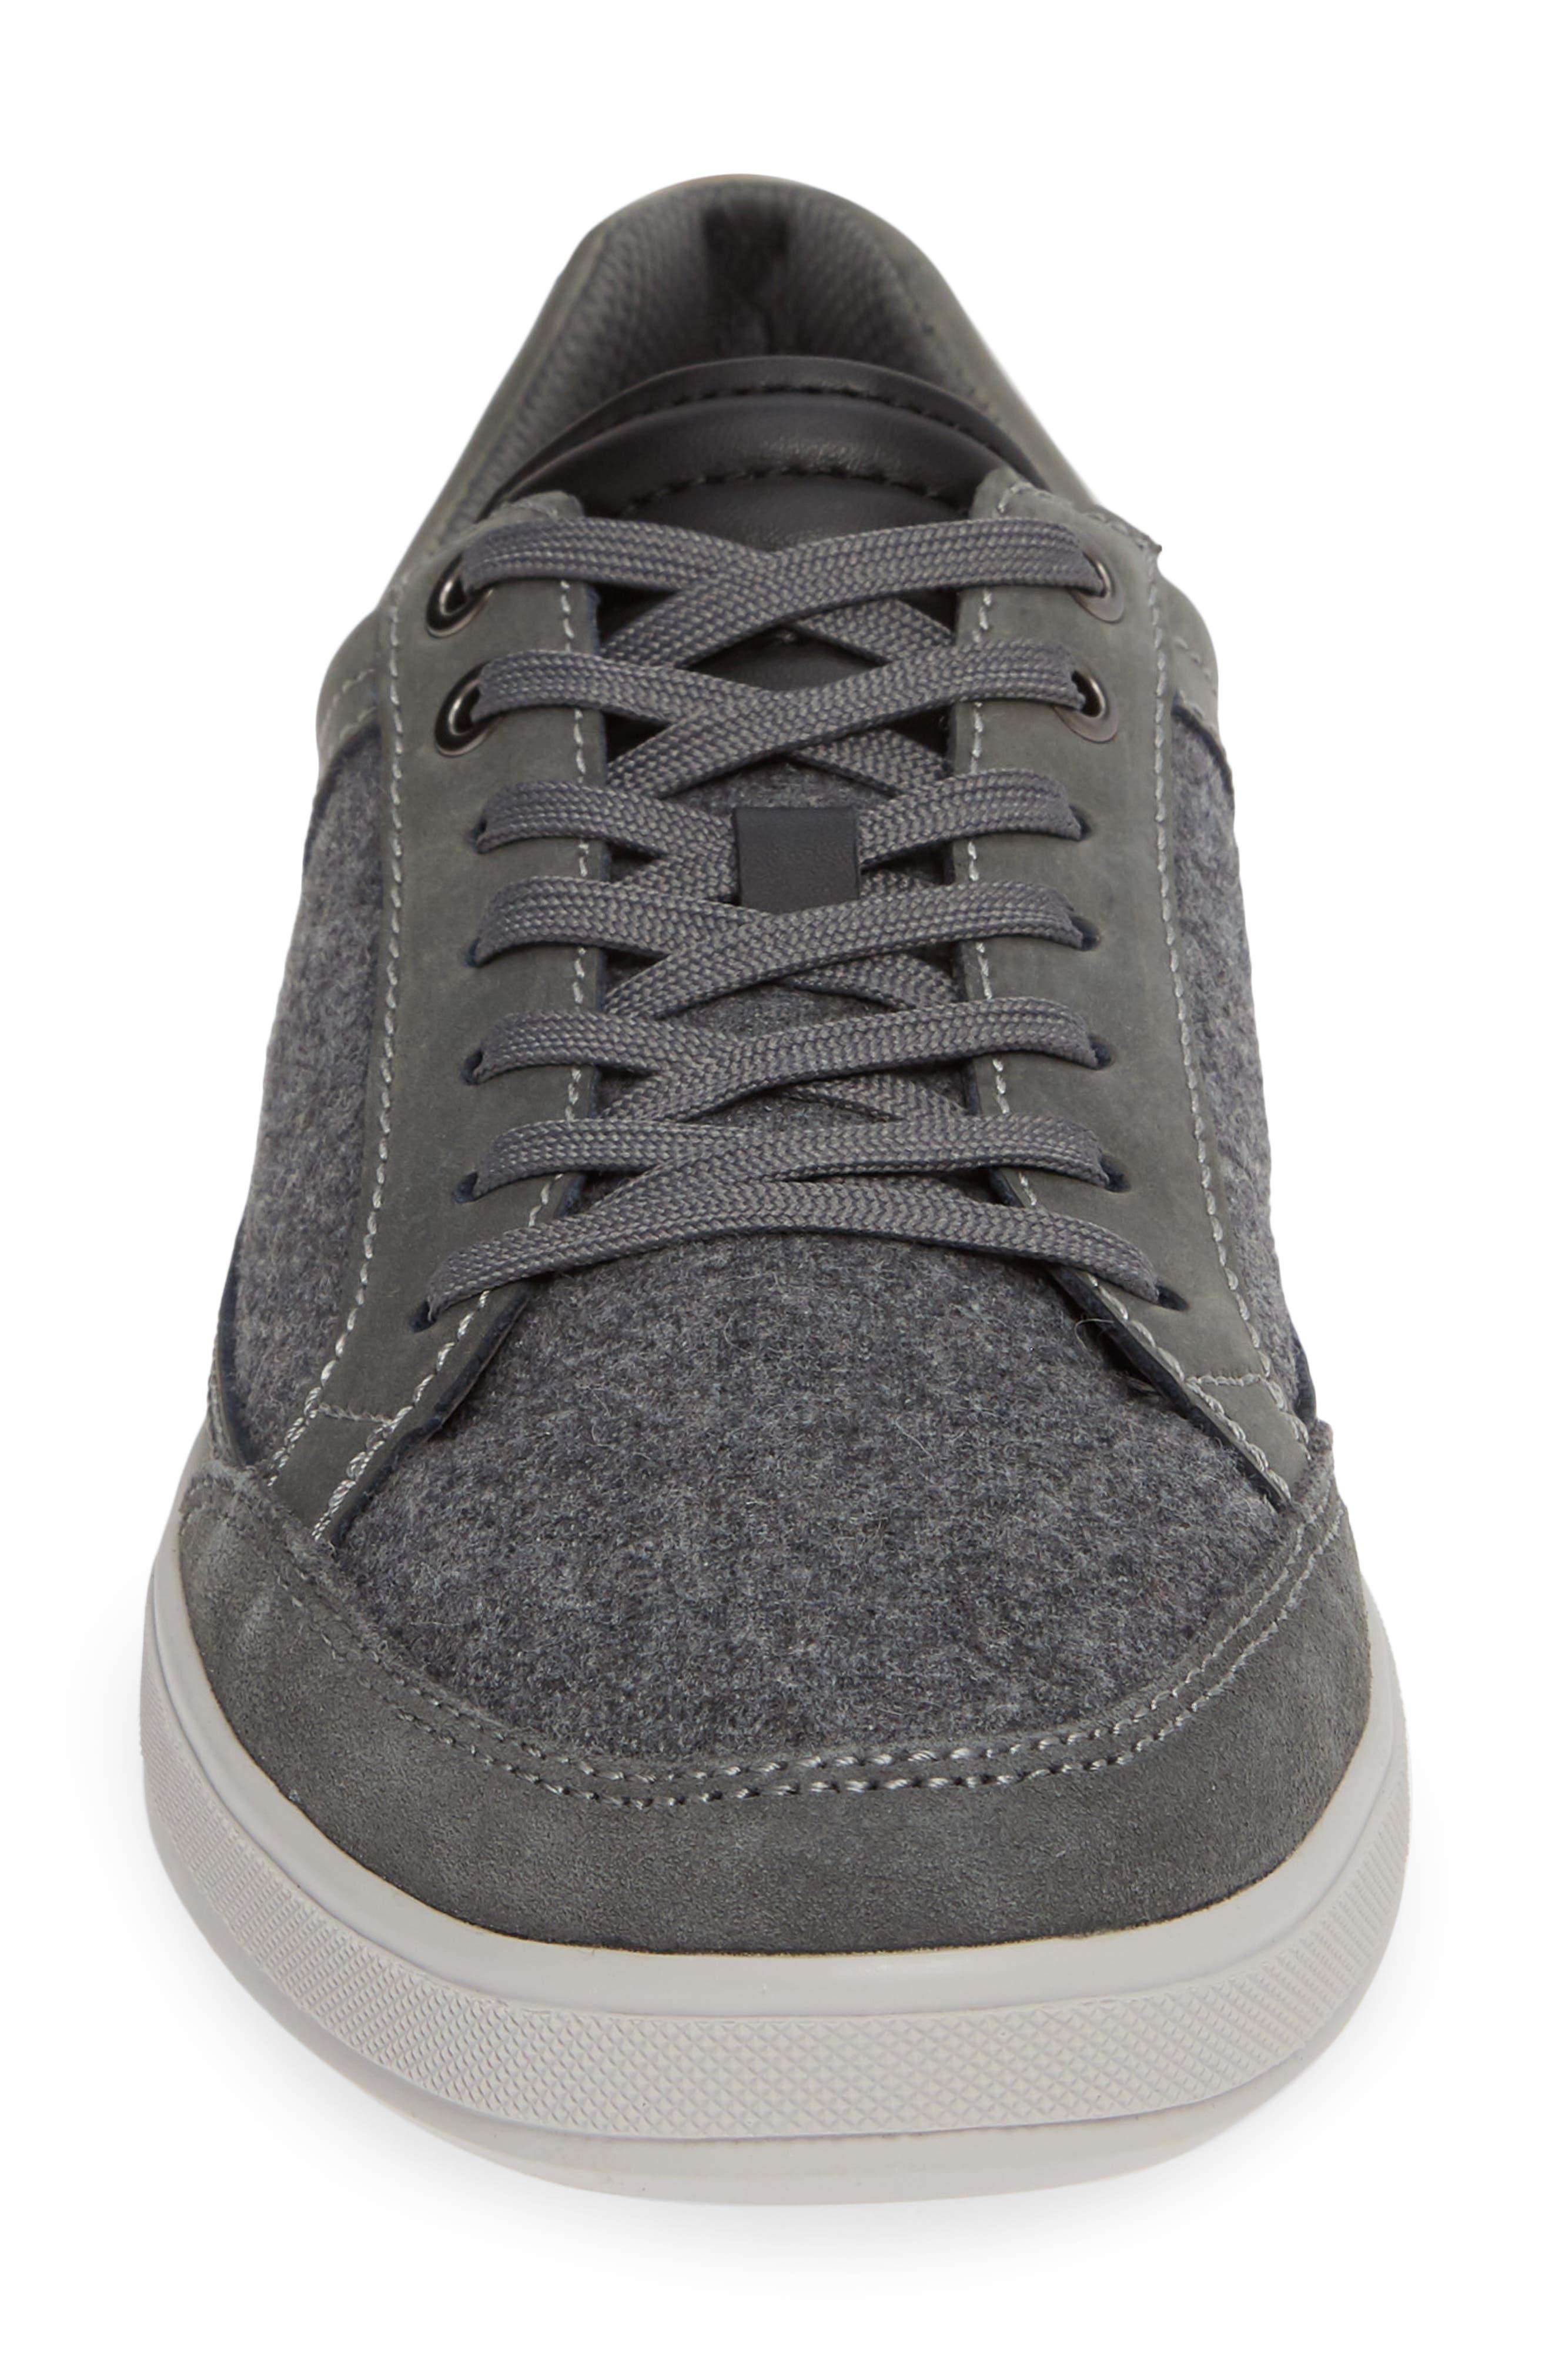 Casual Joe Sneaker,                             Alternate thumbnail 4, color,                             GREY WOOL